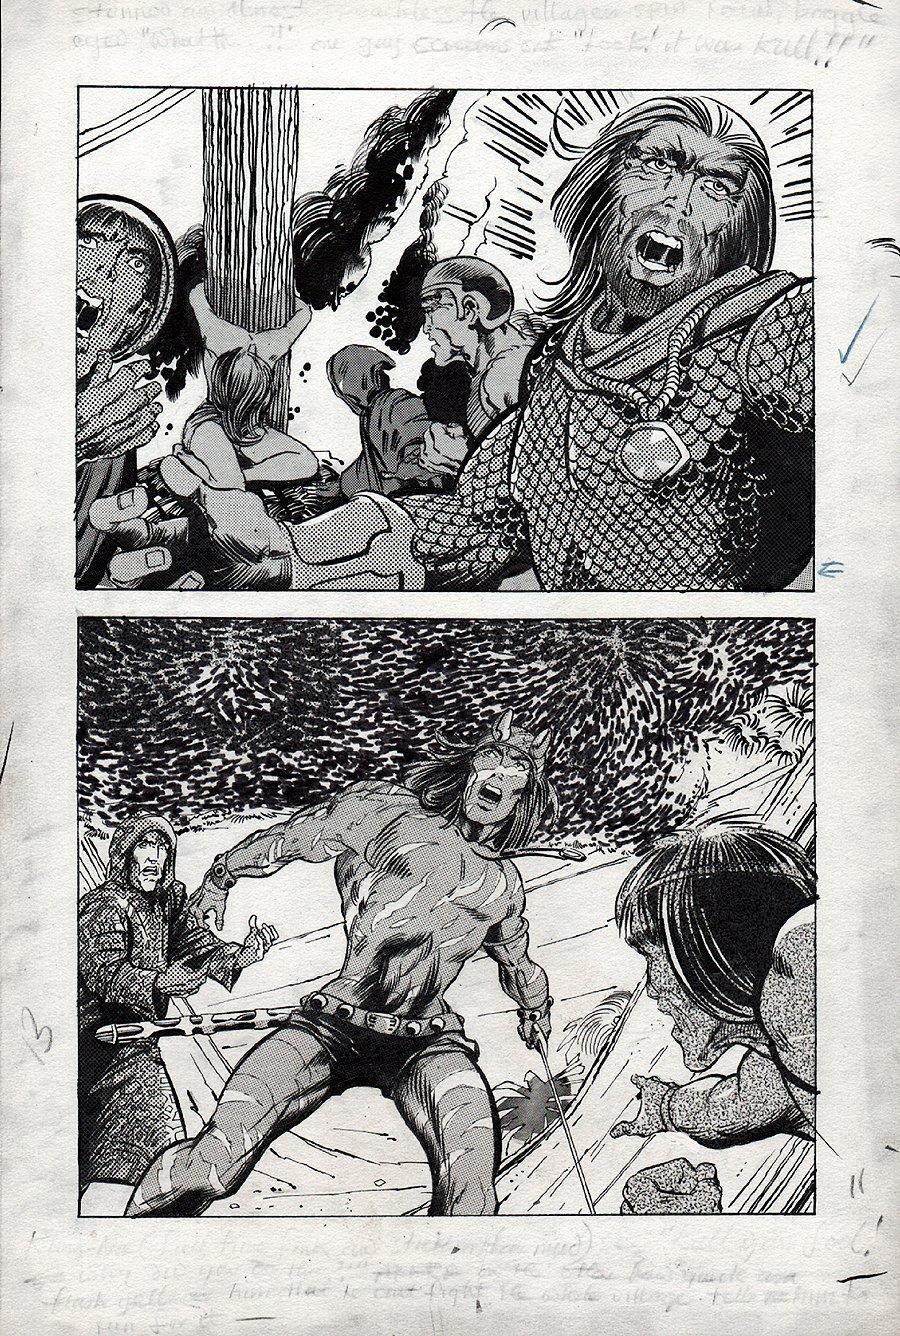 Kull Of Atlantis p 13 (Precursor To Conan The Barbarian #1) 1969-1970